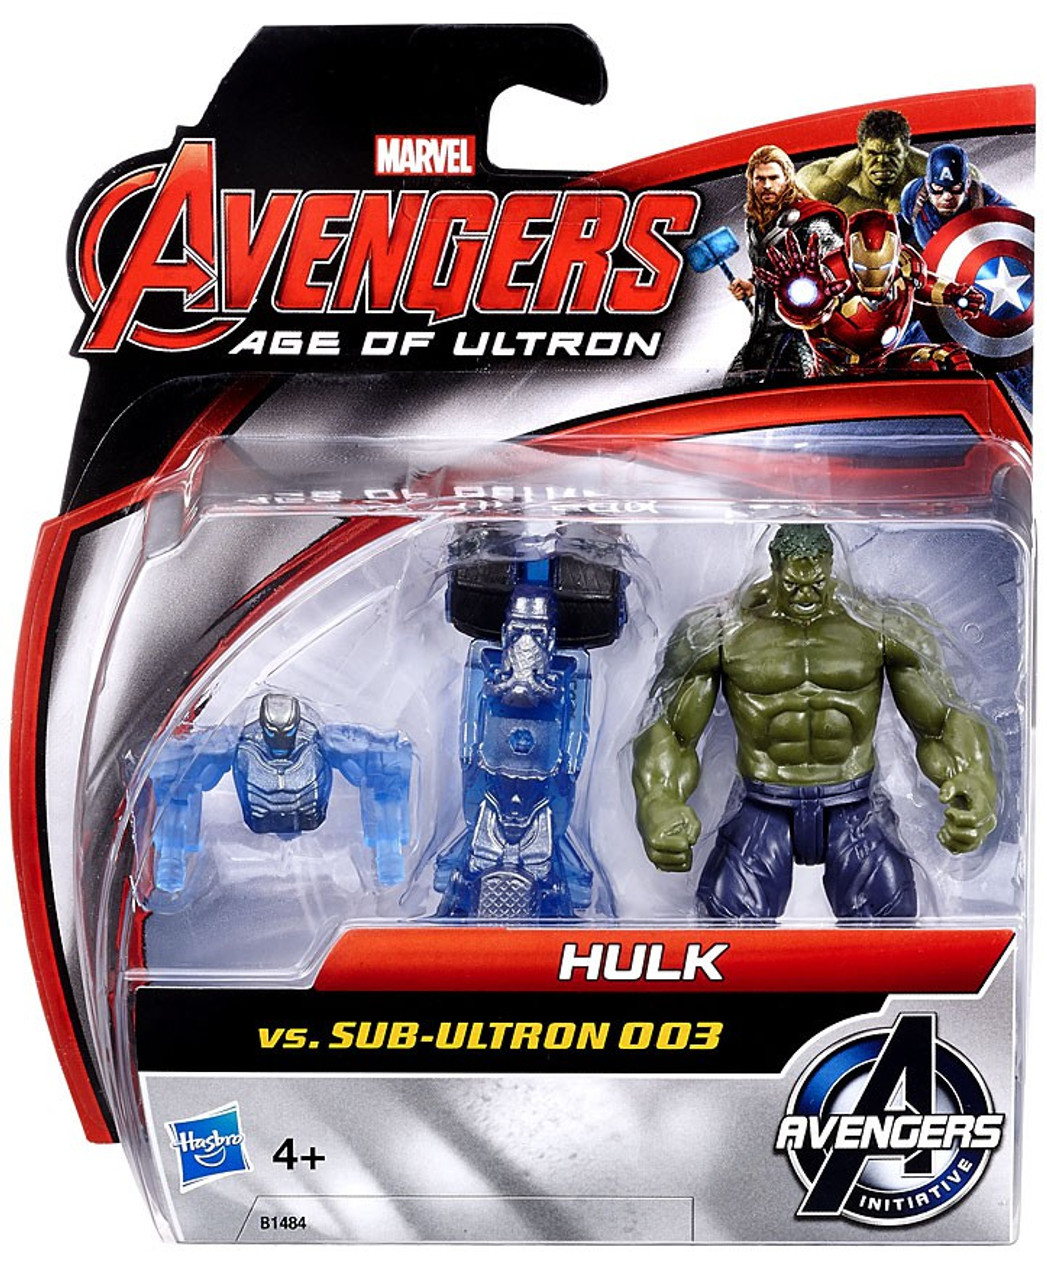 Marvel Avengers Age of Ultron Hulk VS Sous-Ultron 003 2.5 pouces figure pack